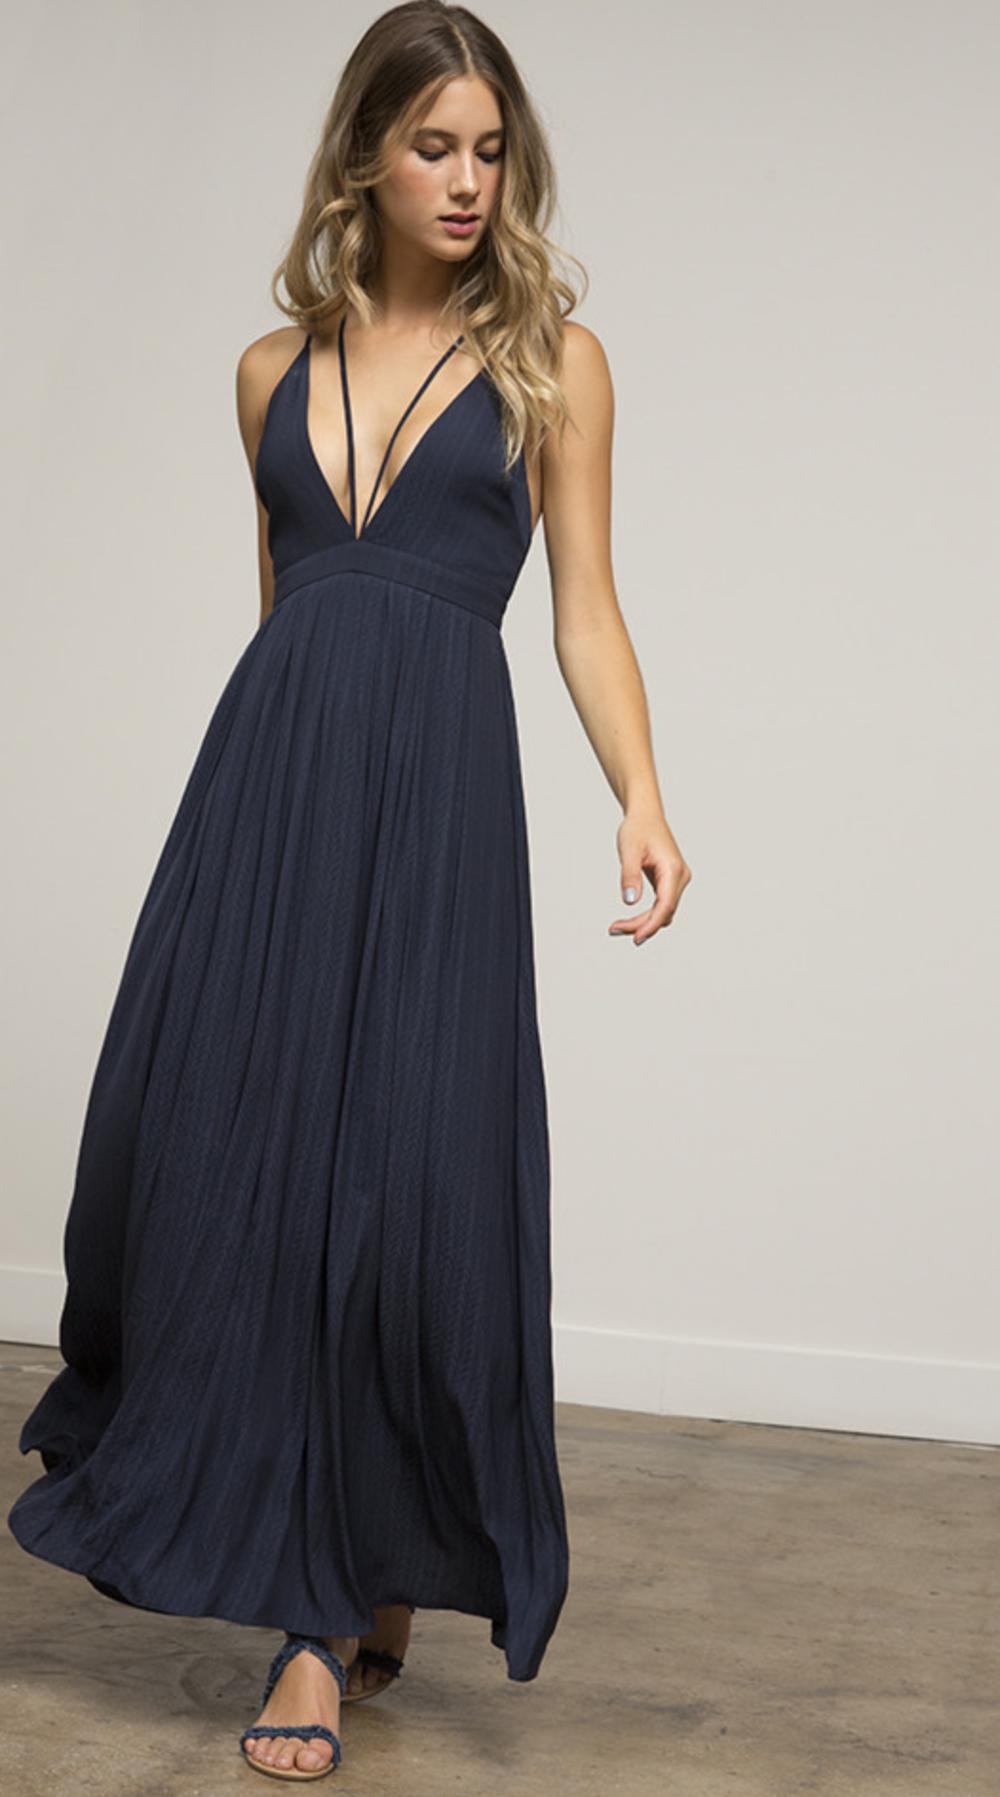 Celine Maxi Dress- Click Here